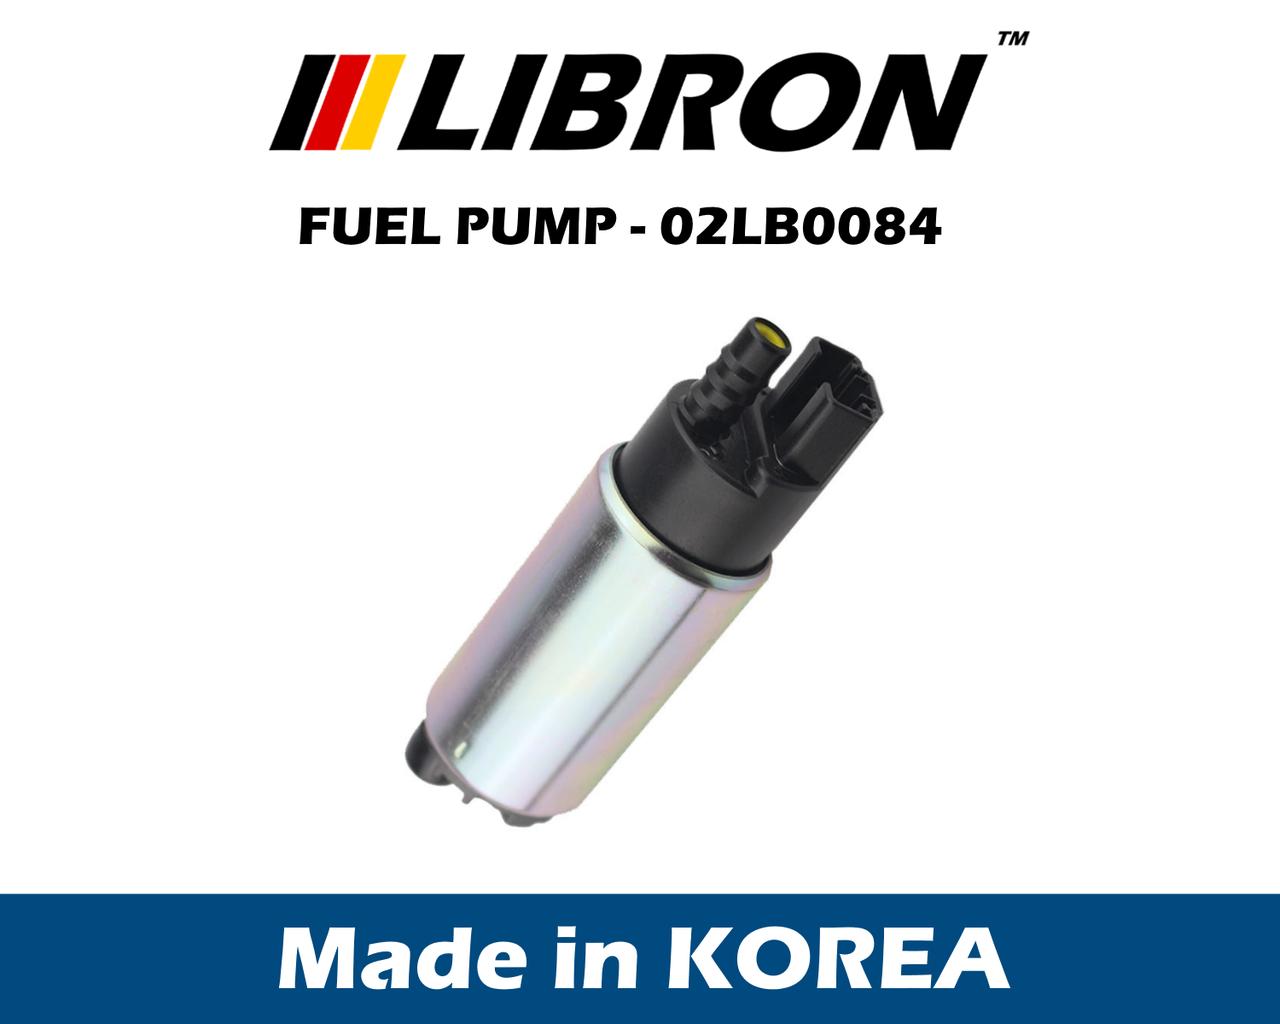 Бензонасос LIBRON 02LB0084 - Хонда Легенд II купе